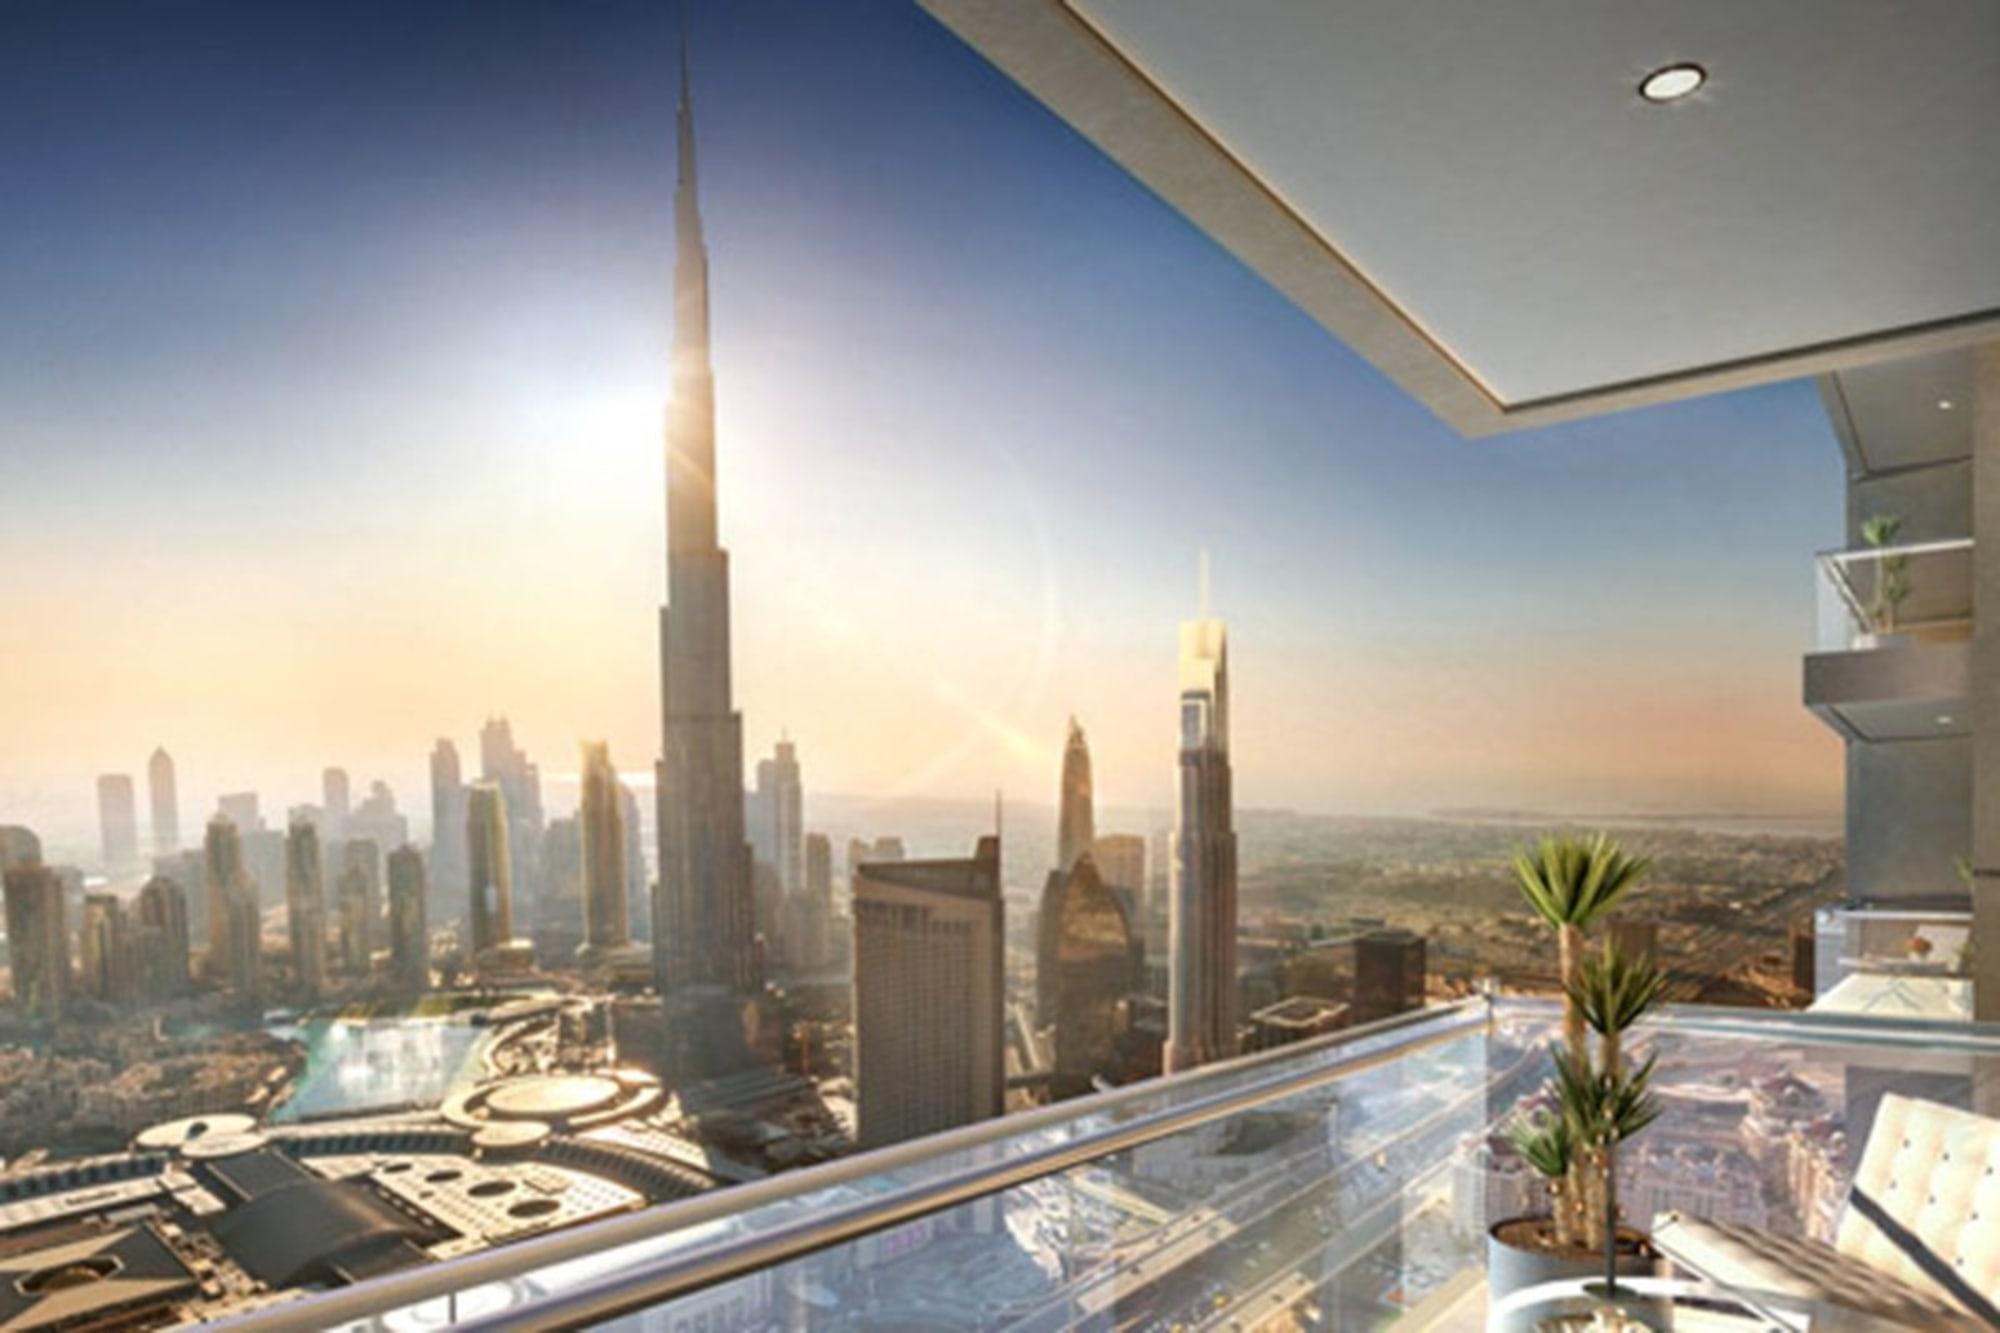 Beautiful 3BR Burj View |75% Post Handover 5 Years